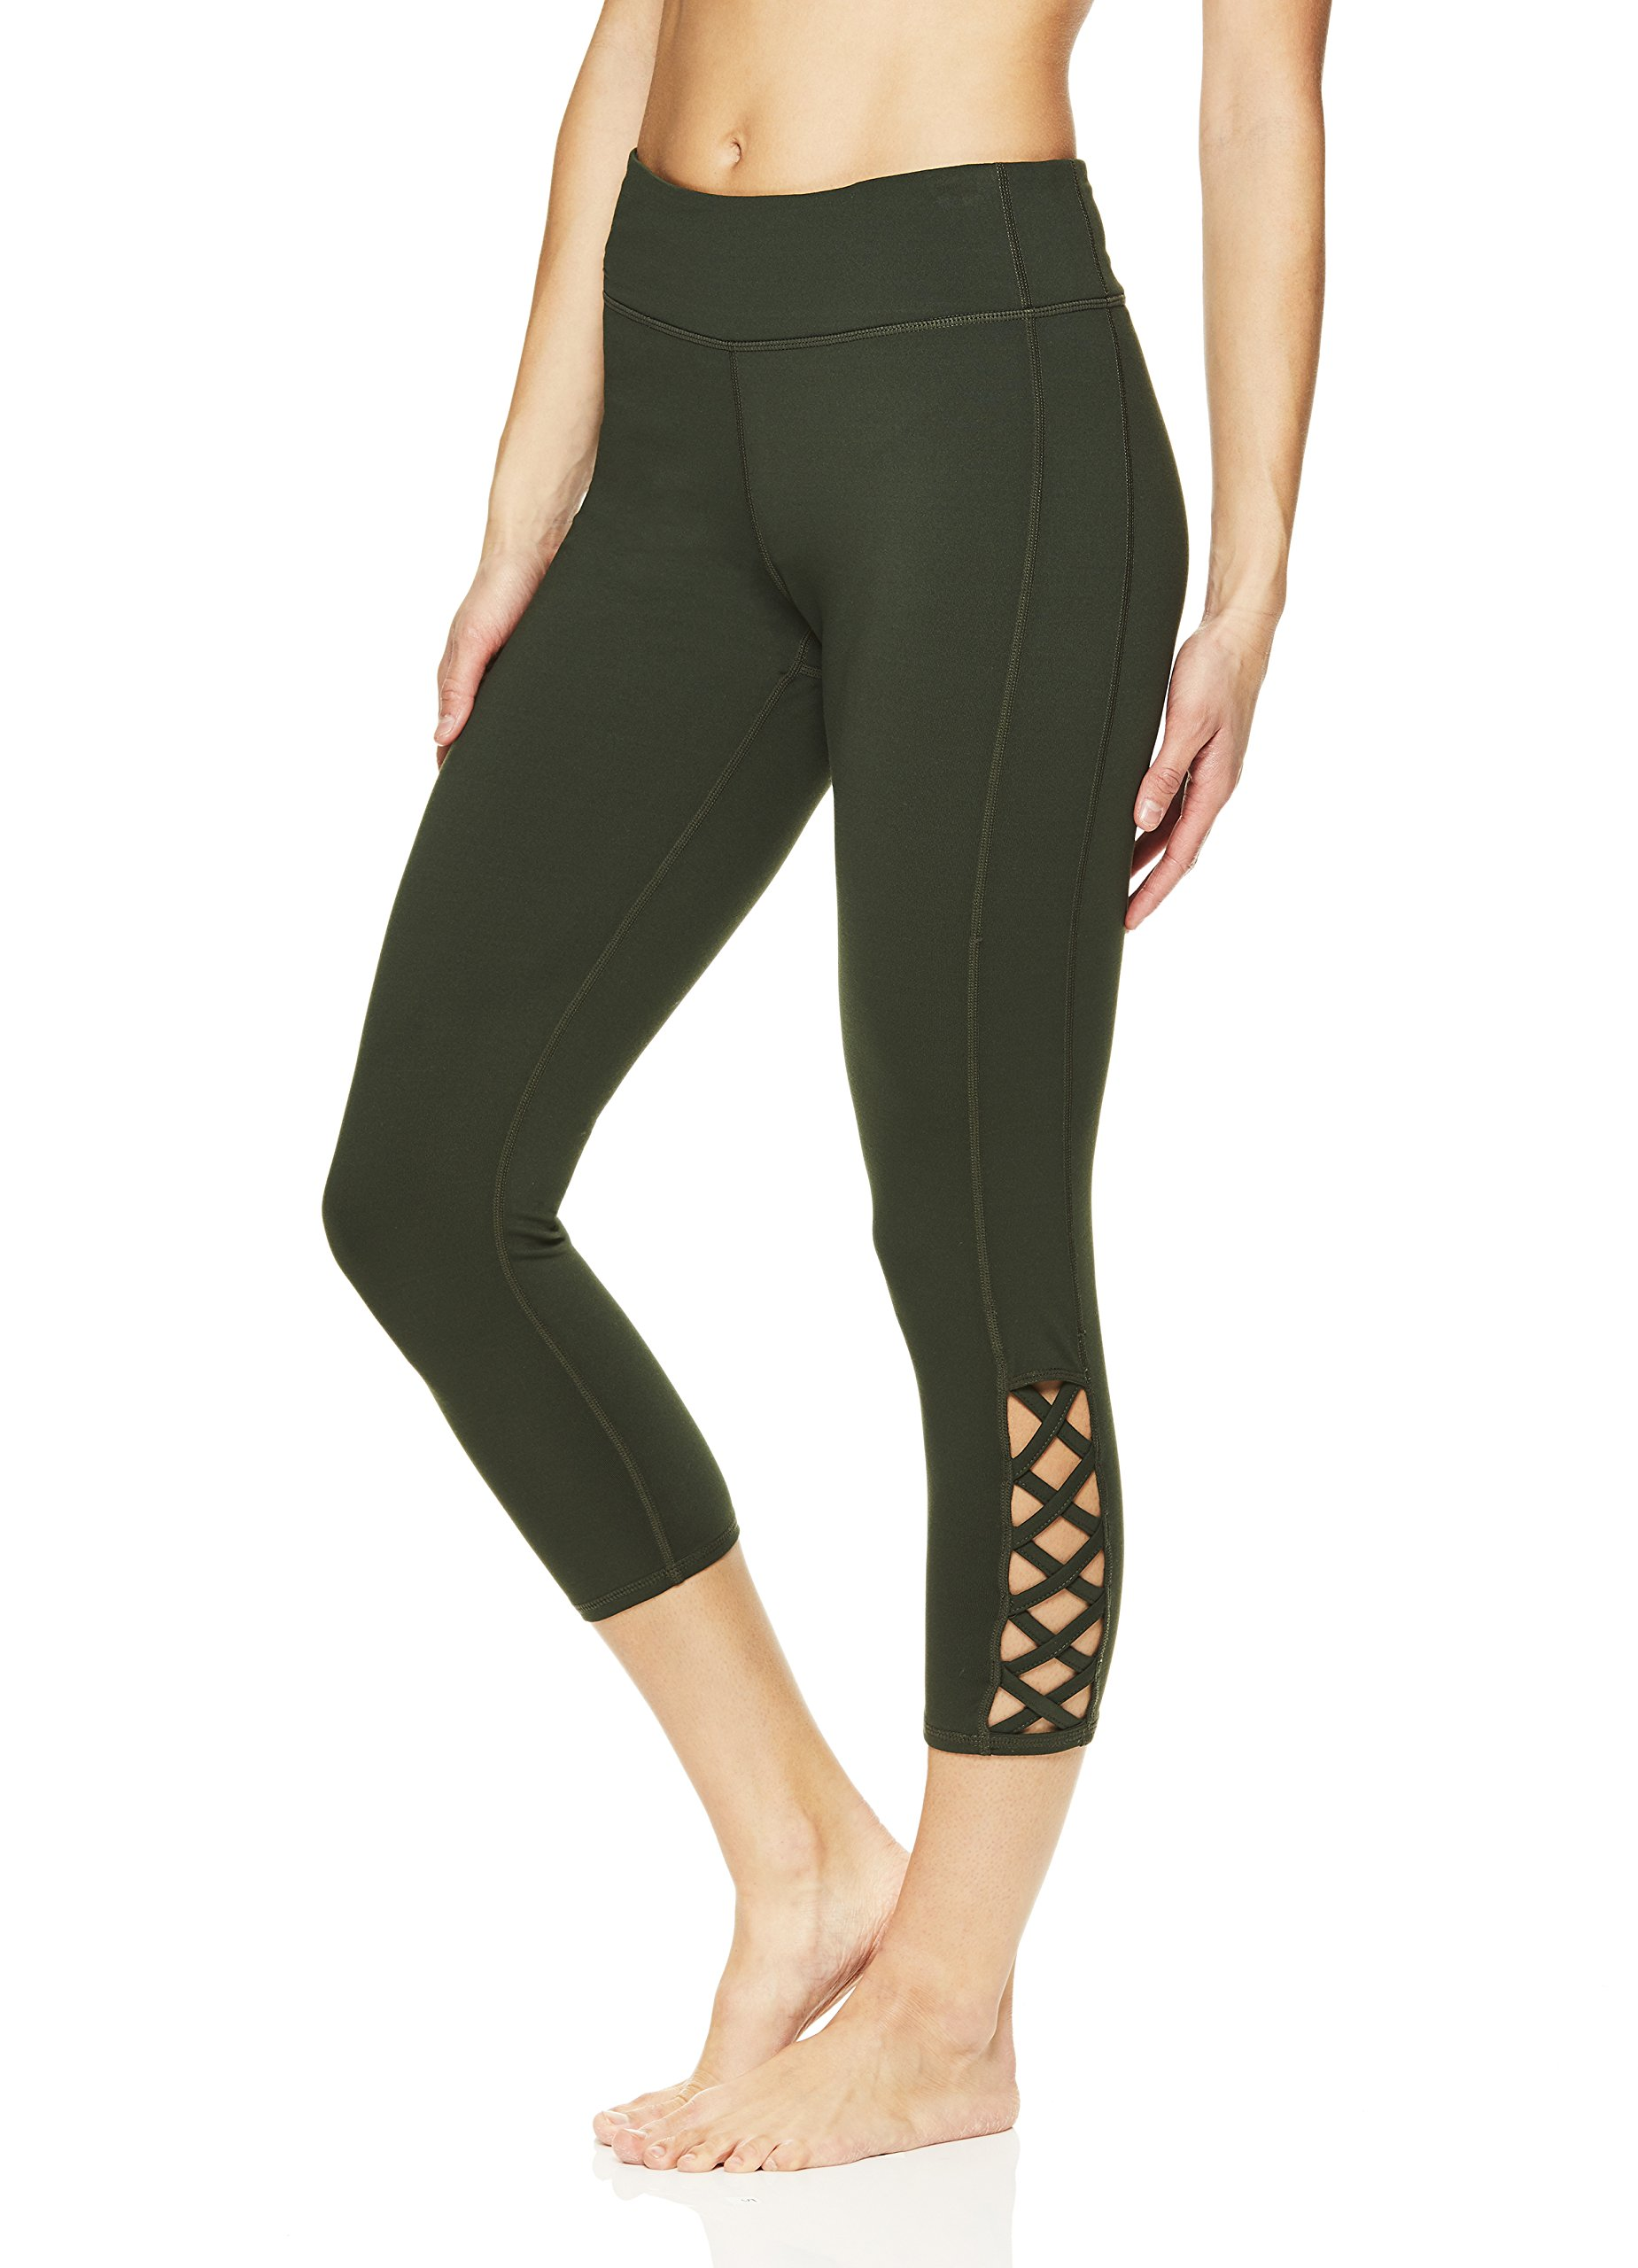 Gaiam Women's Capri Yoga Pants - Performance Spandex Compression Legging - Dufflebag, 3X by Gaiam (Image #2)